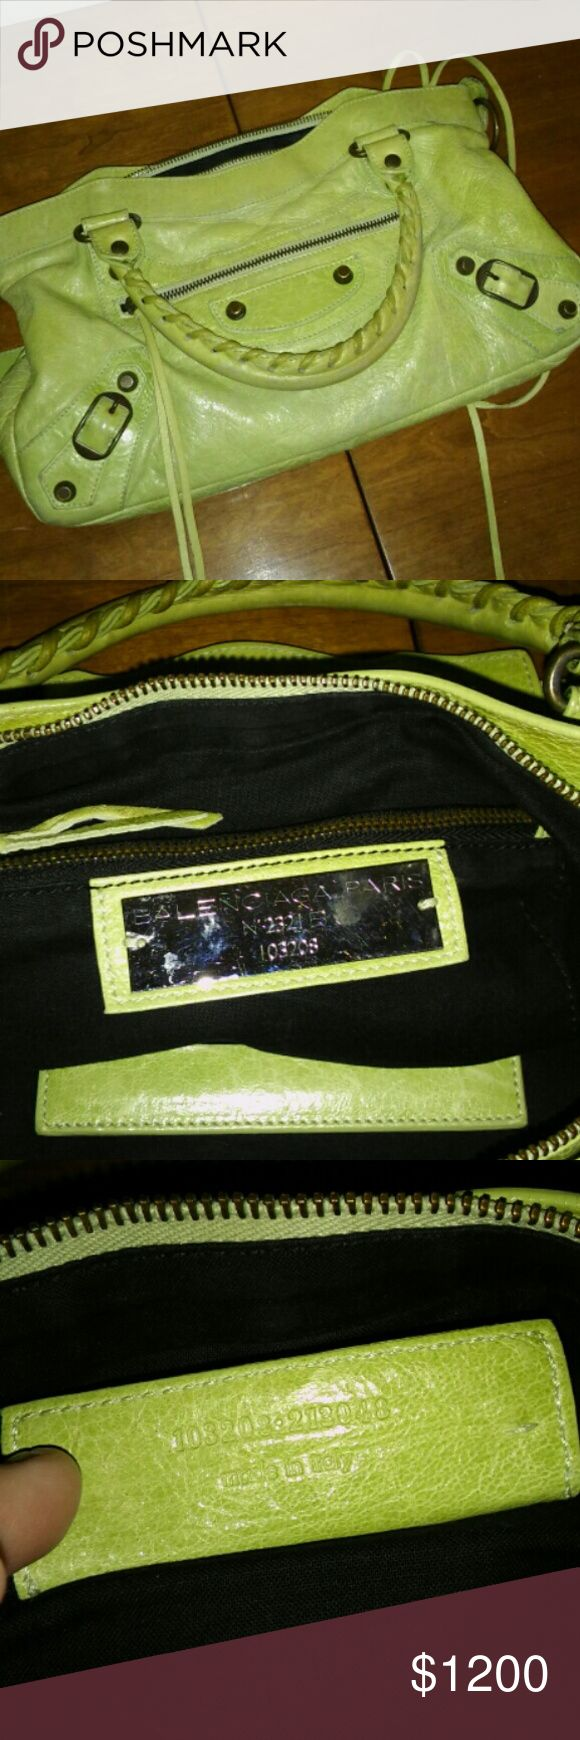 Balenciaga First City bag Incredible authentic Balenciaga First City Bag, made in Italy. Pistachio color. Pics show wrong color. It's like a wasabi green, pistachio green. Balenciaga Bags Satchels